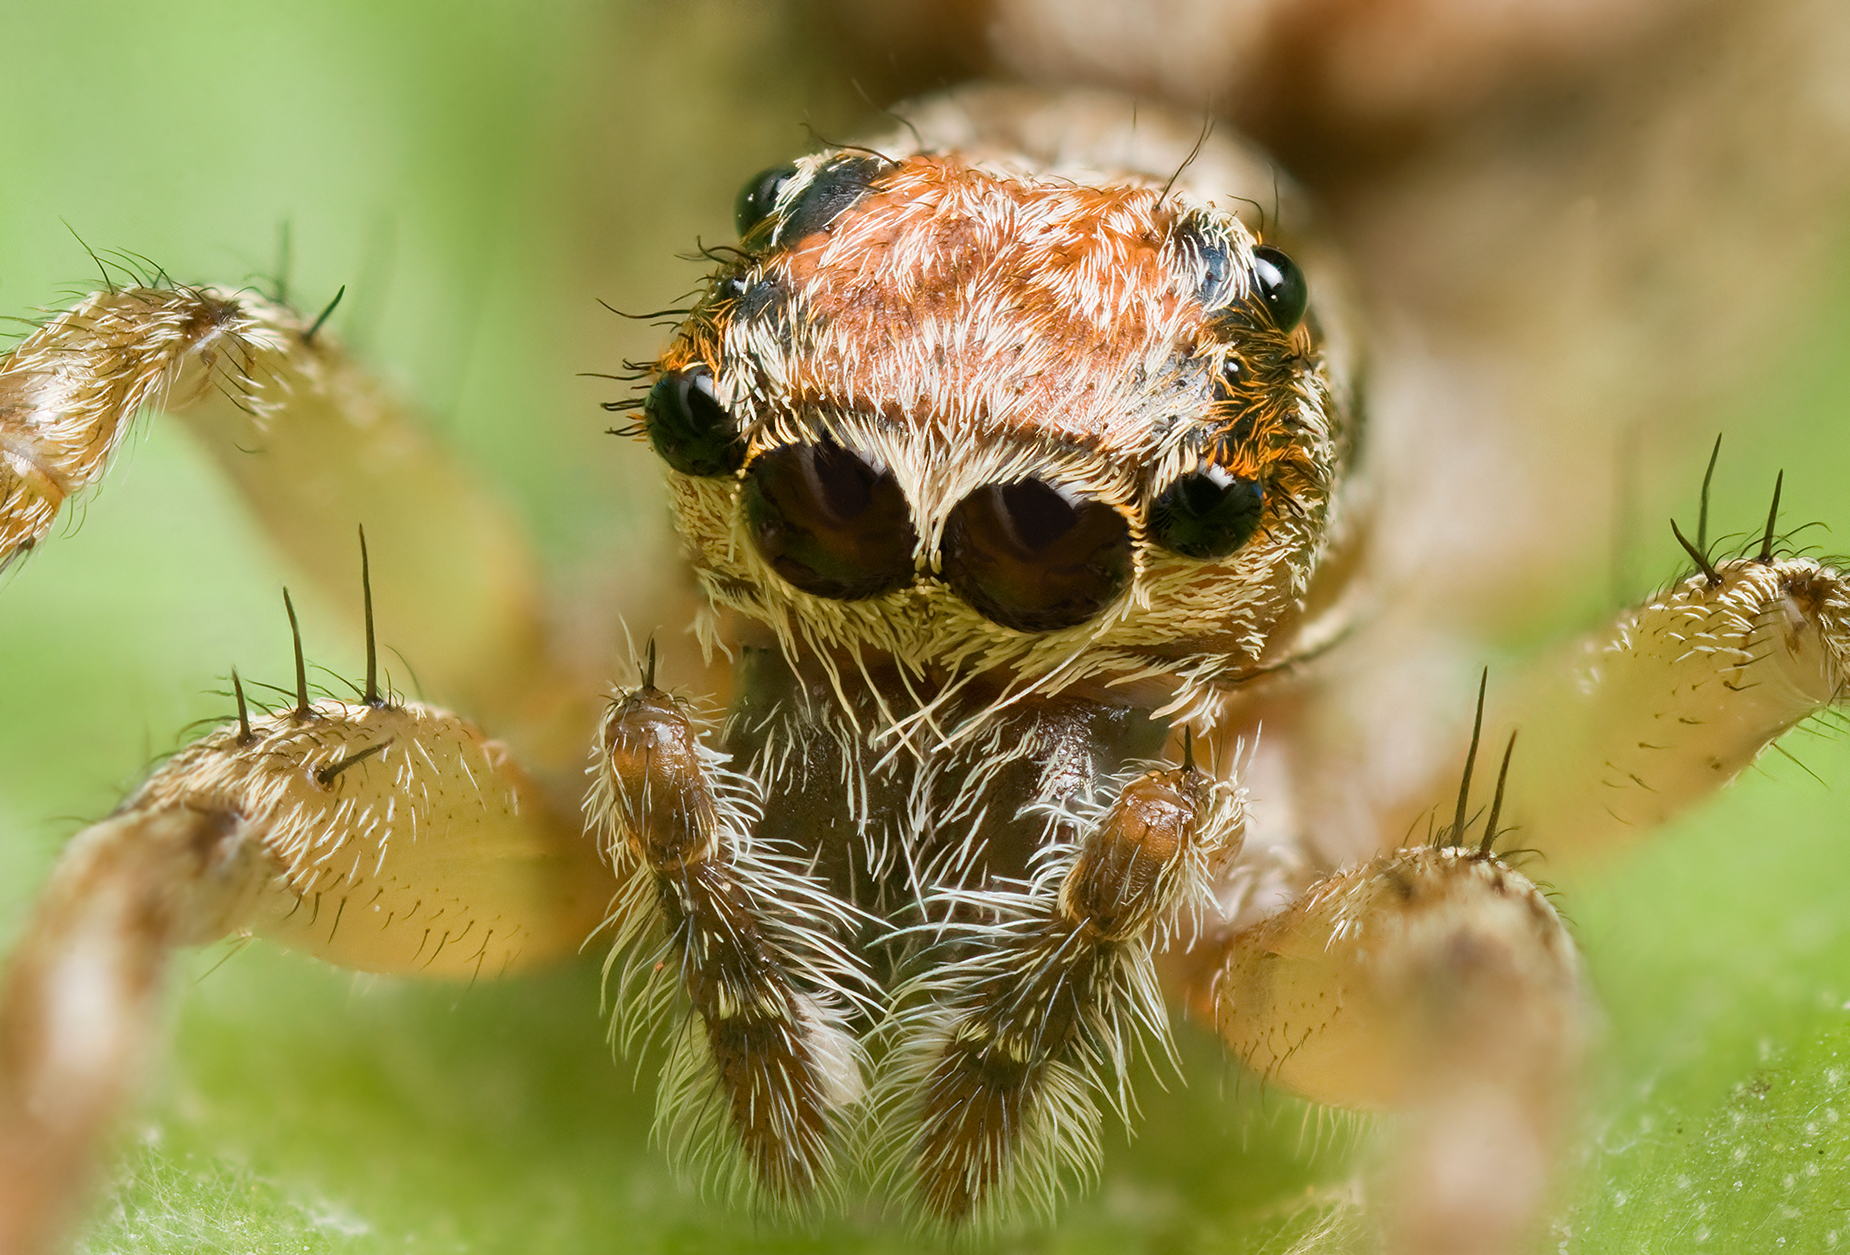 I Hallucinate Seeing Massive Spiders